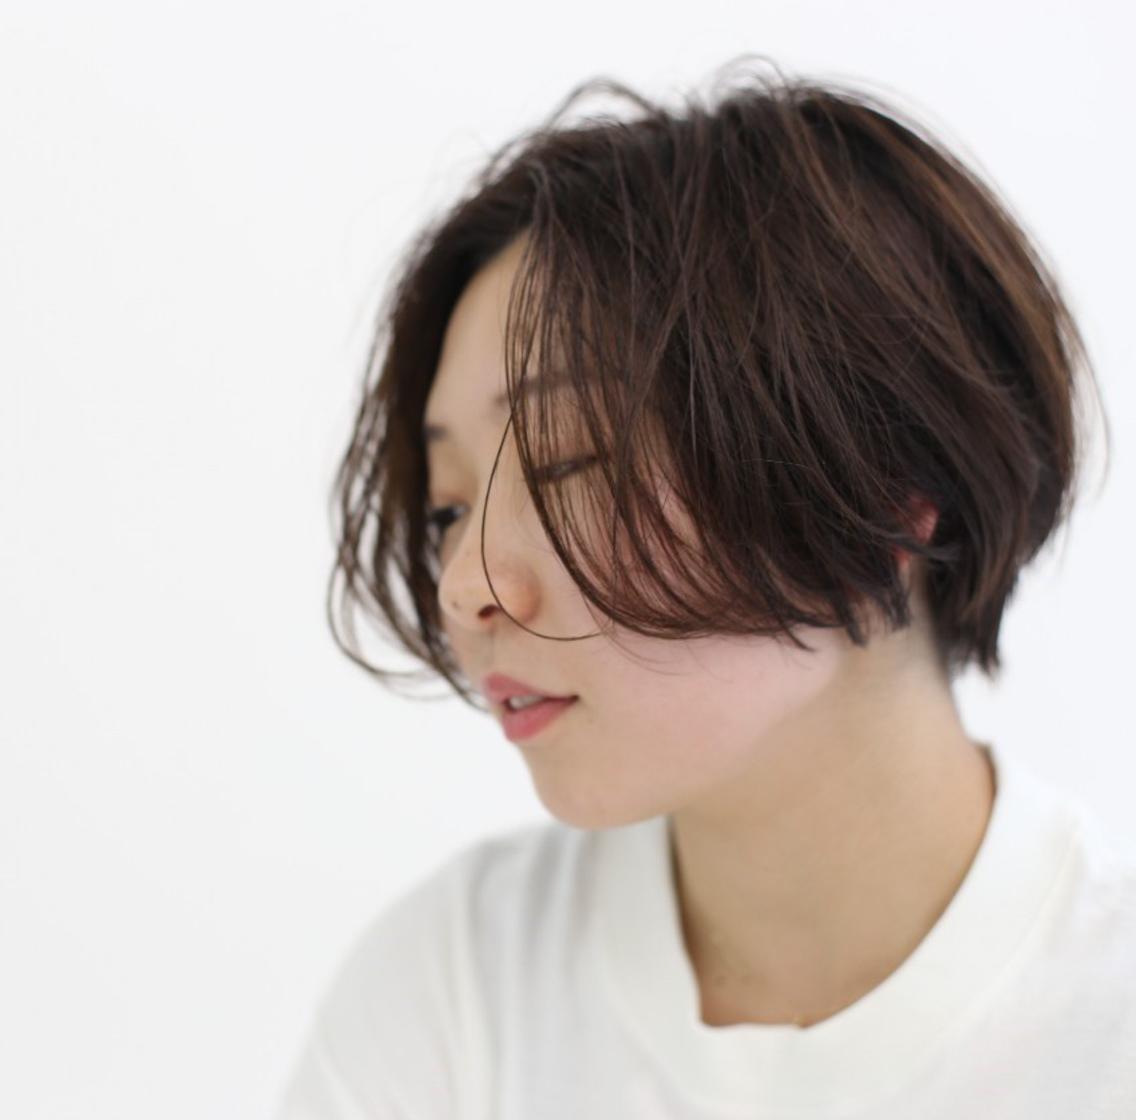 color /◻︎(コロル)所属・樋口 雄稀の掲載